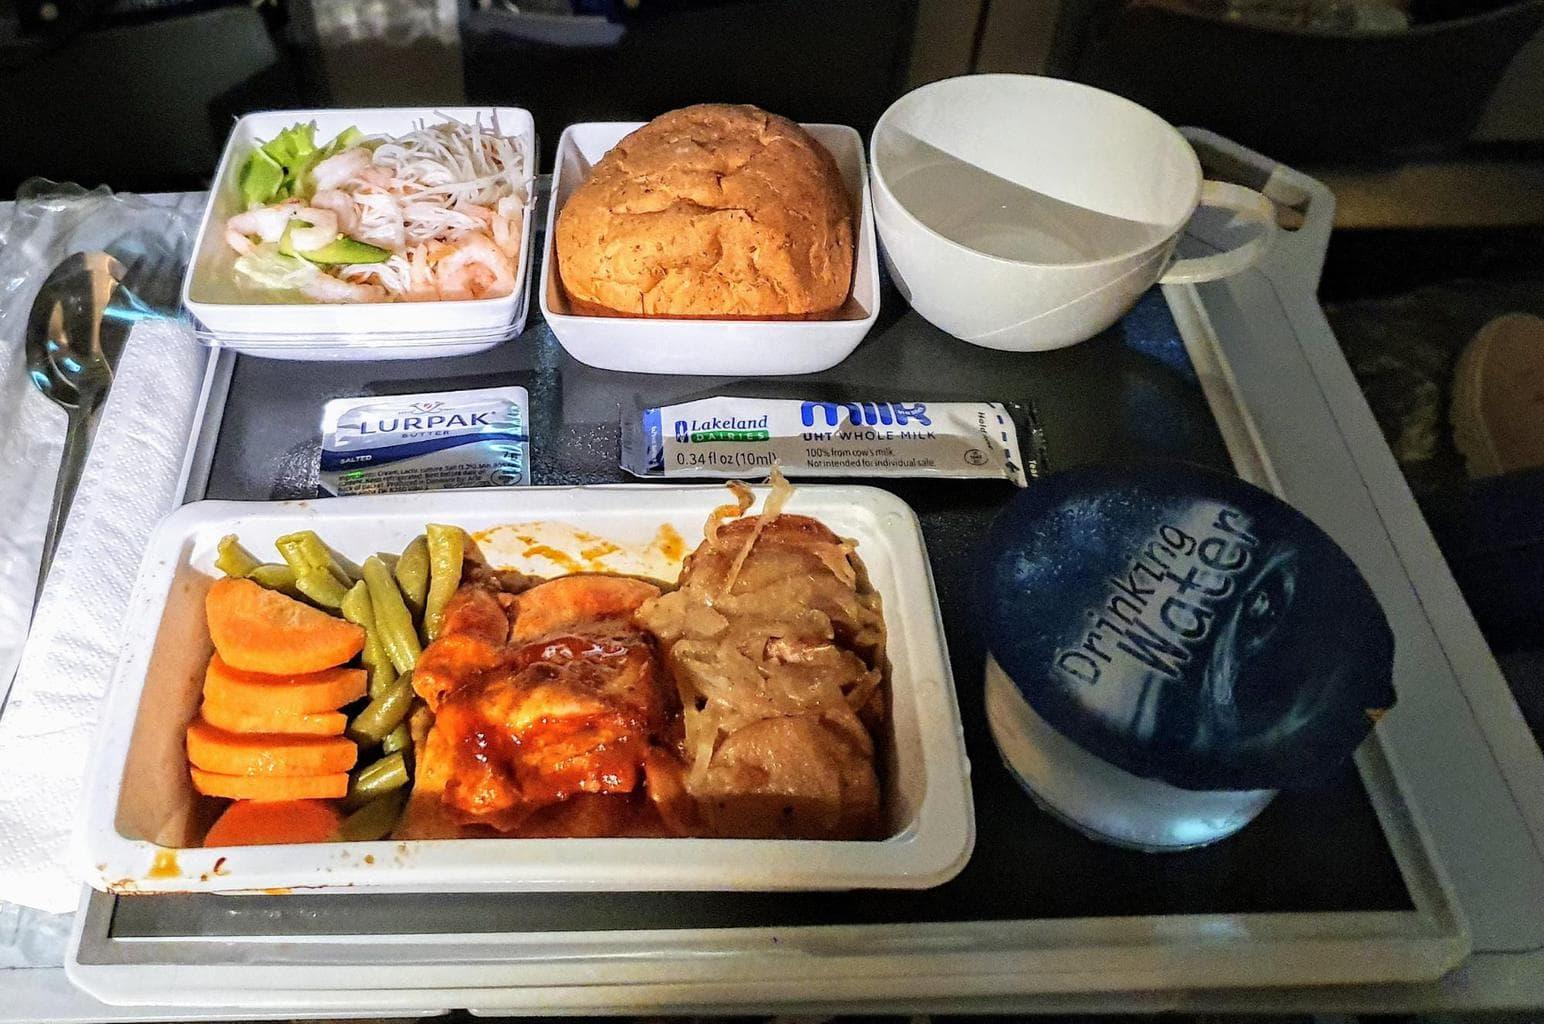 Dinner service on Singapore Airlines Premium Economy